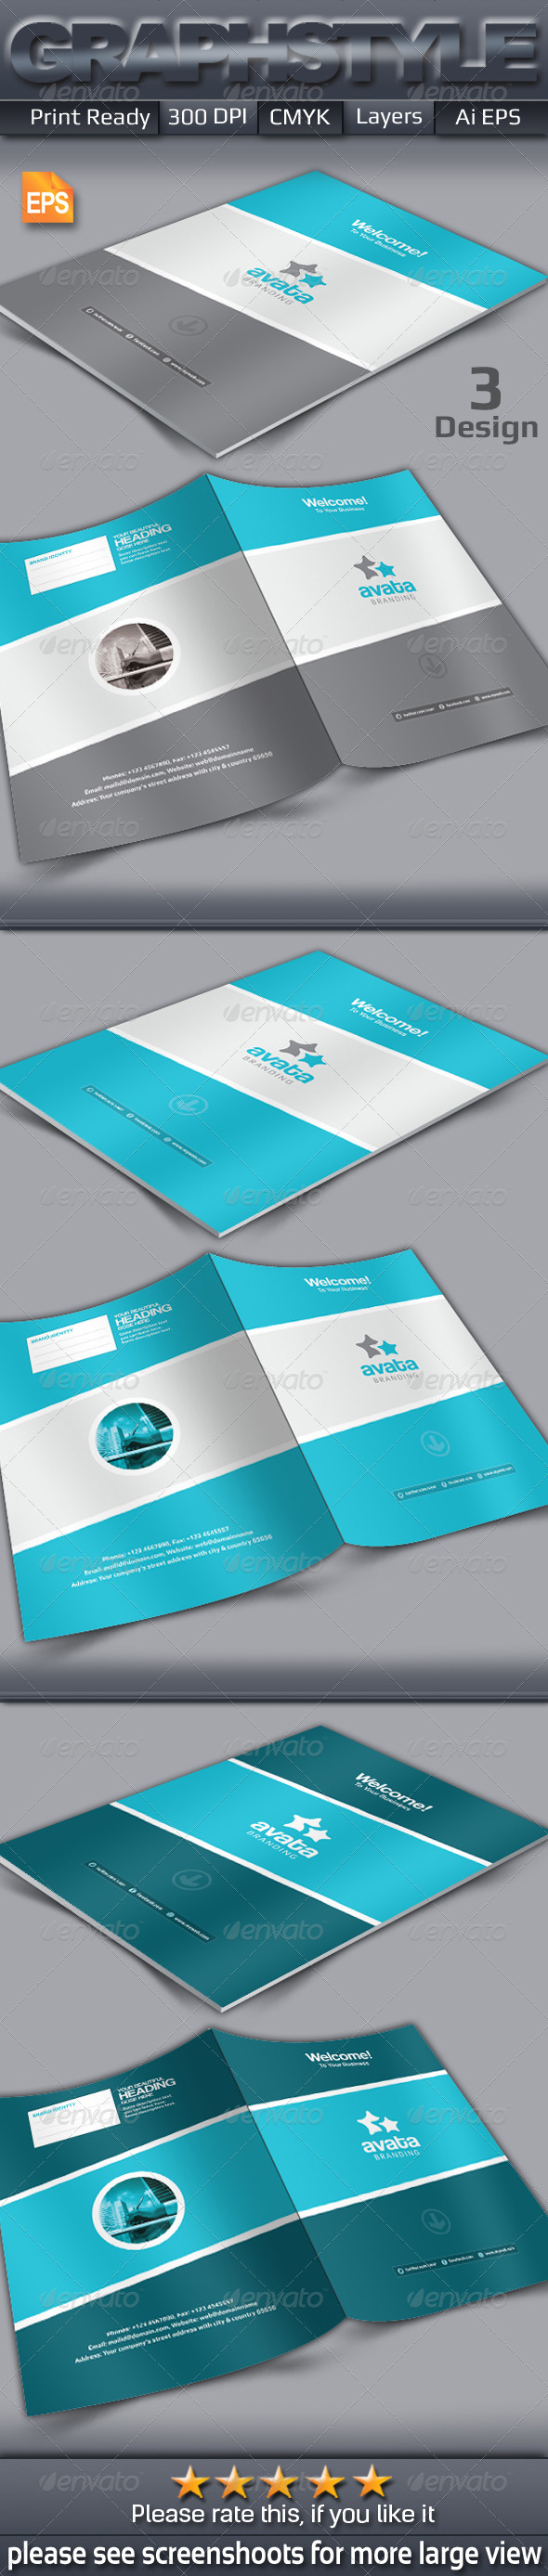 GraphicRiver Avata Presentation Folder 7144840